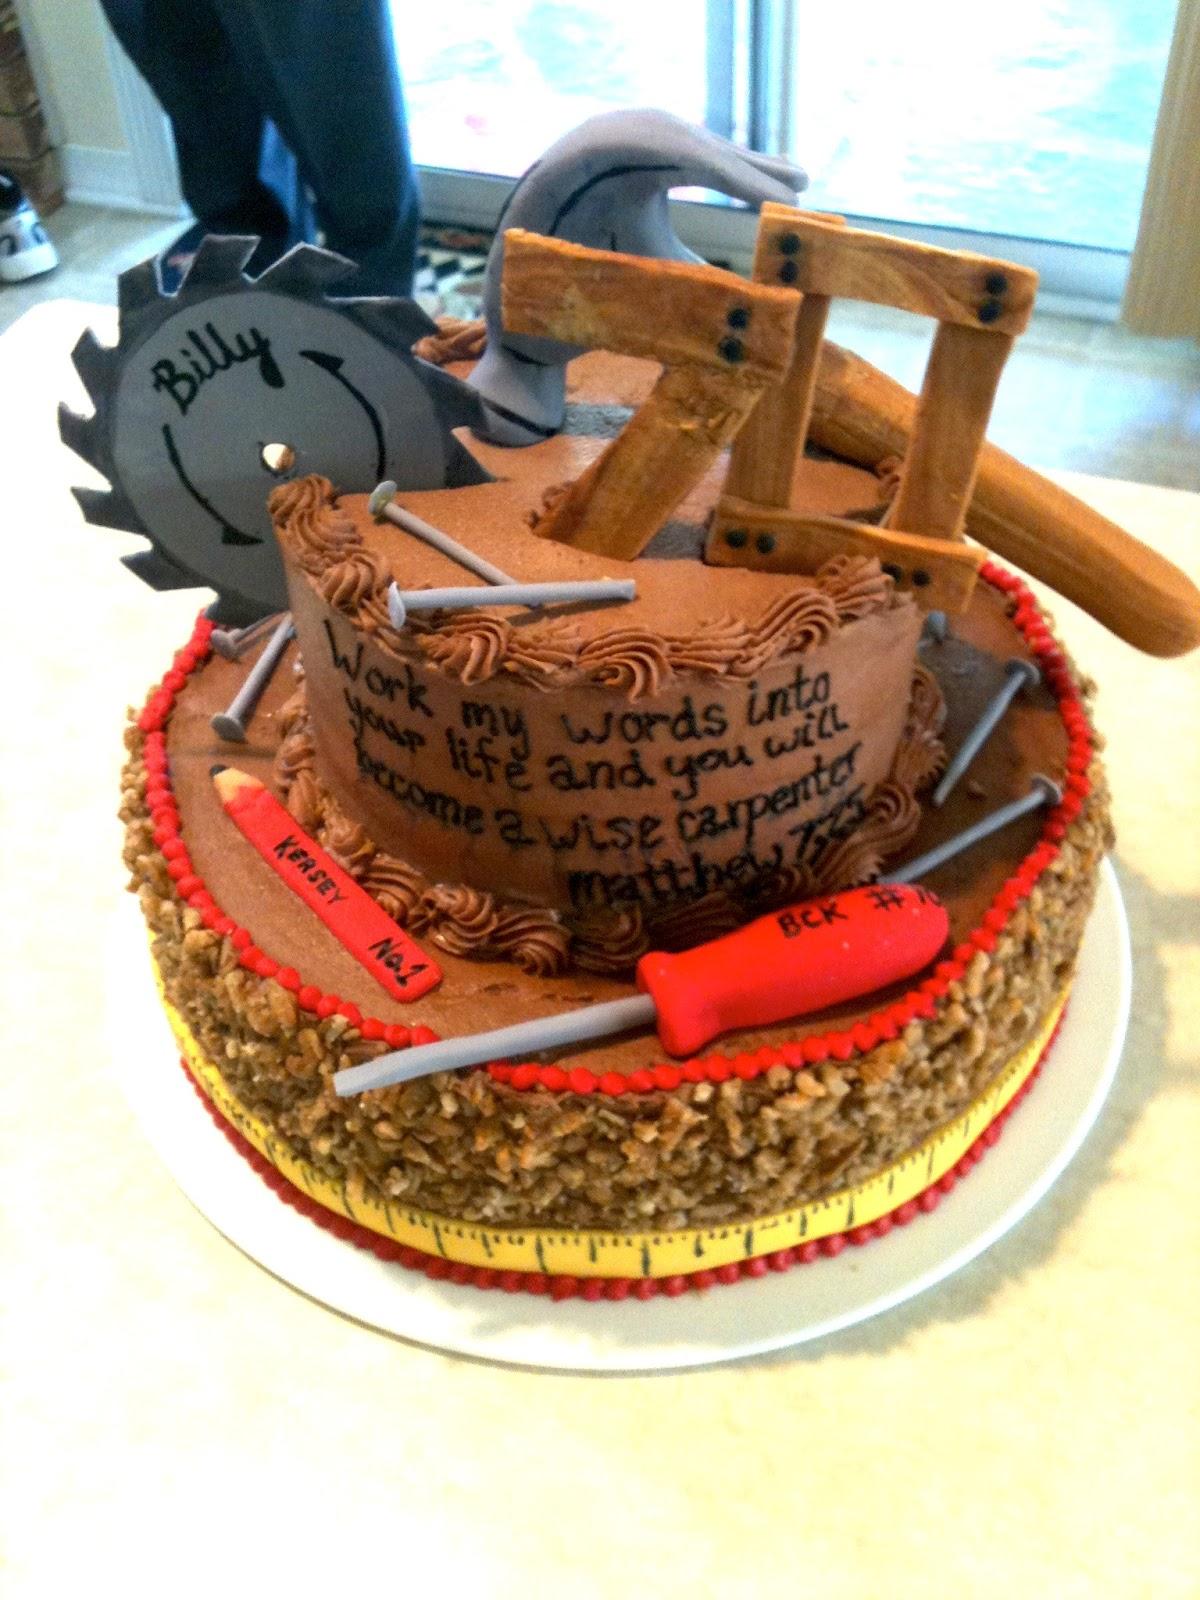 Carpenter Cake On Pinterest Tool Cake 70th Birthday